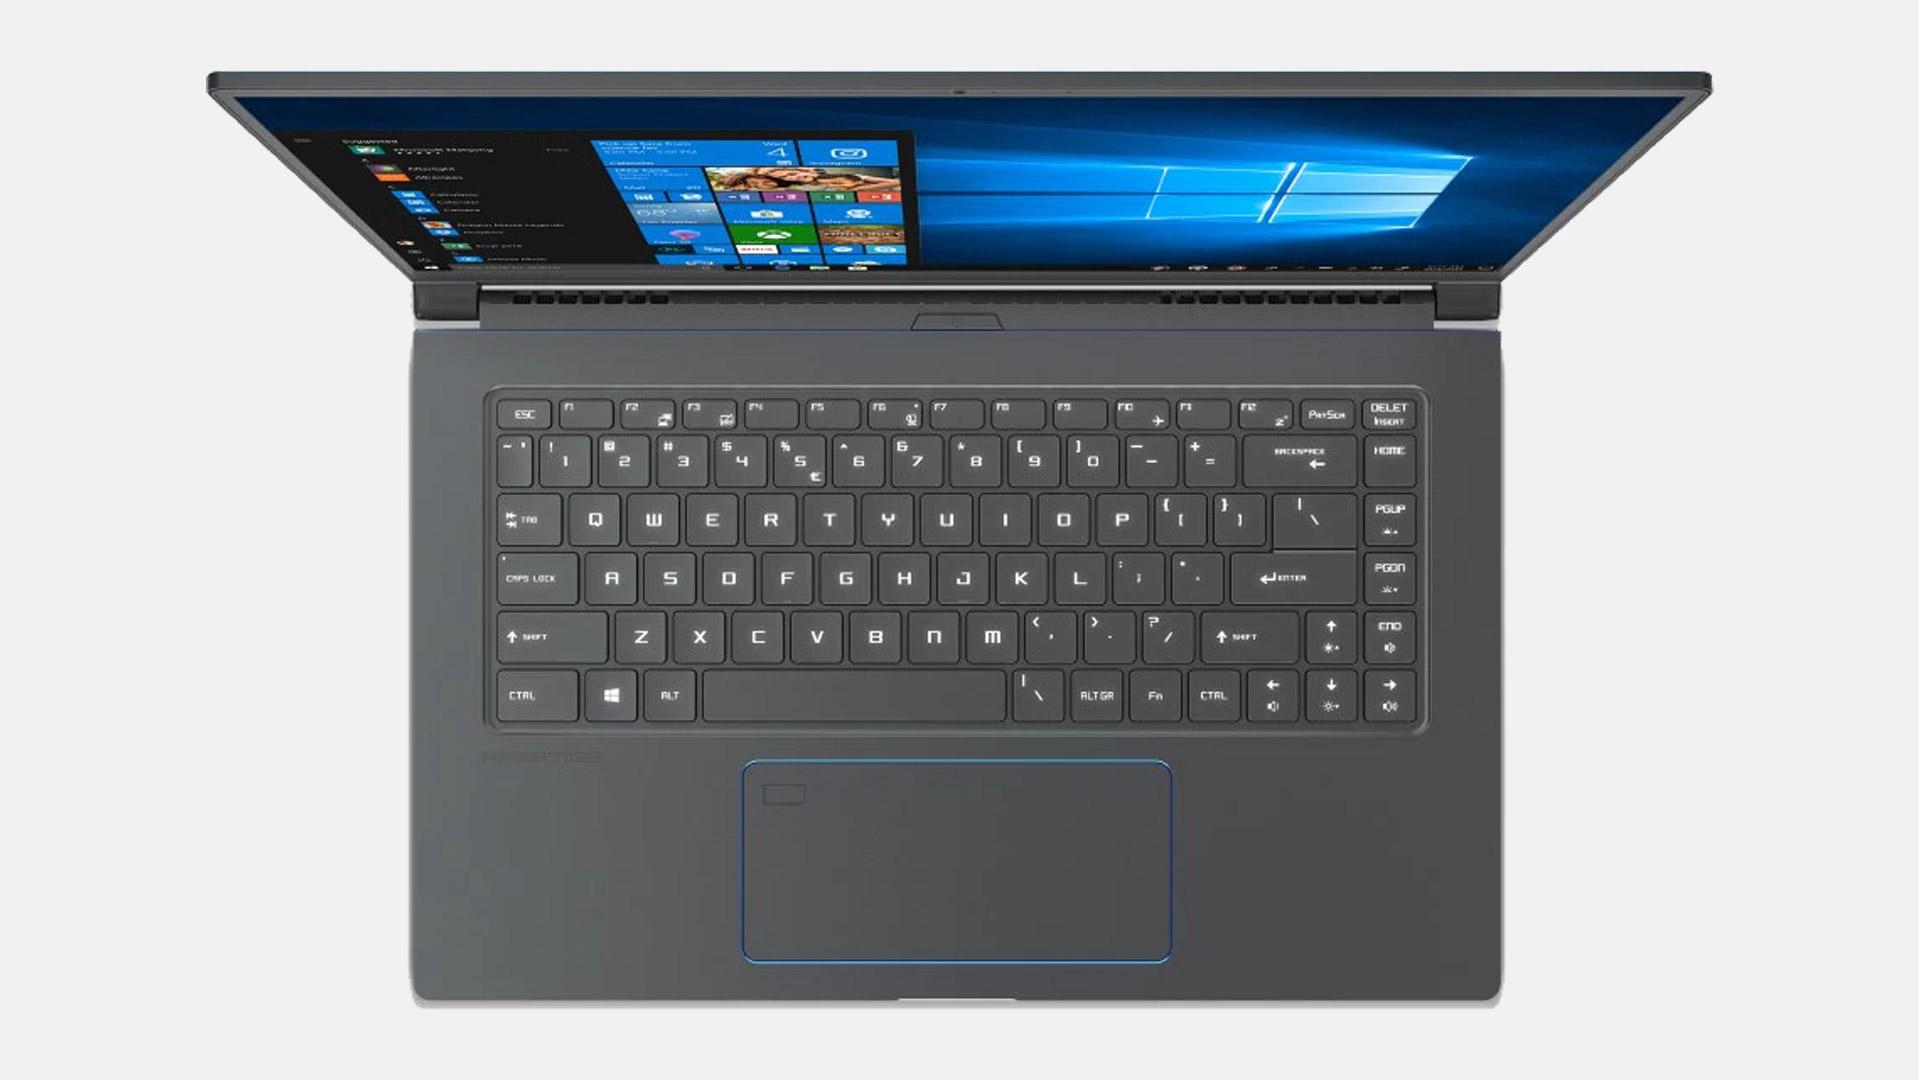 لپ تاپ ام اس آی PS63 8SC